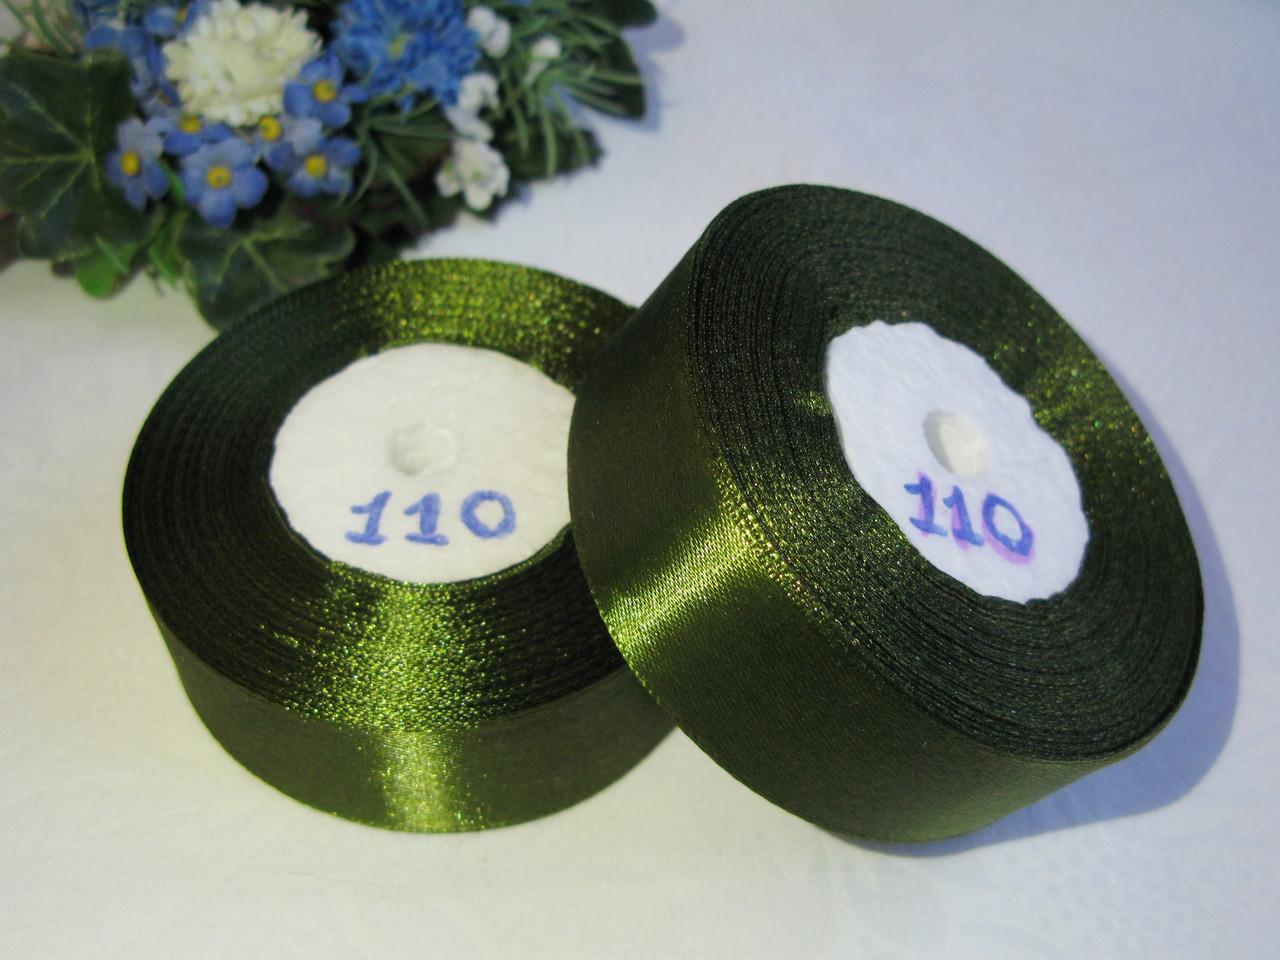 Лента атласная. Цвет темно-оливковый. Ширина 2.5 см